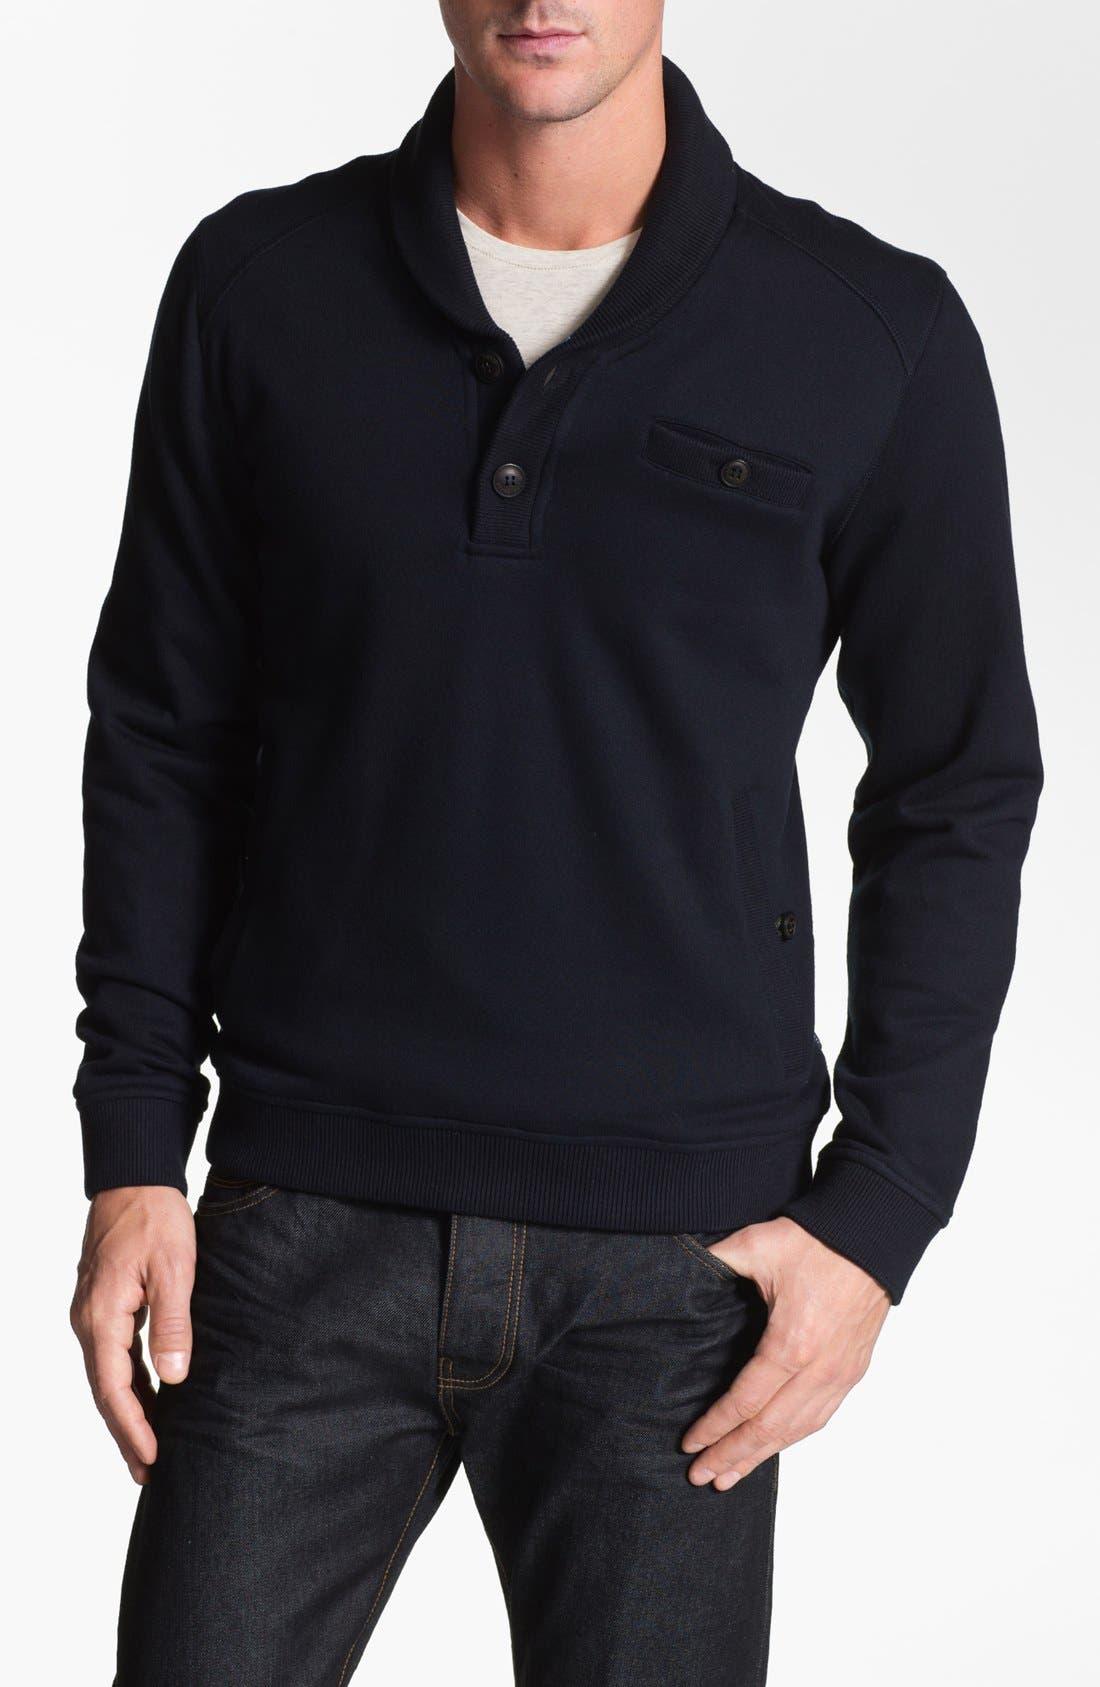 Alternate Image 1 Selected - Ted Baker London 'Norush' Shawl Collar Sweatshirt